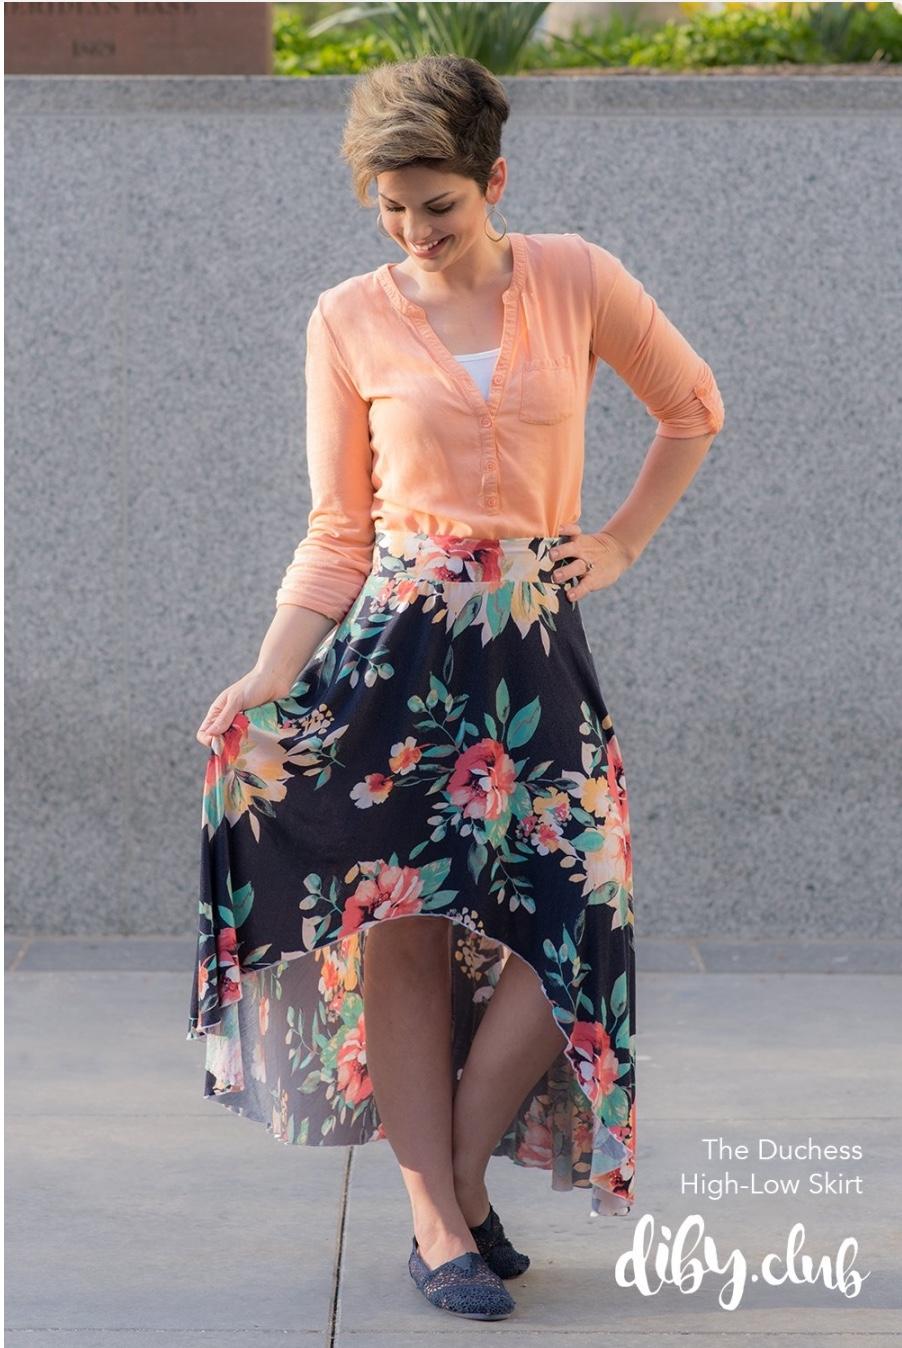 Duchess HL Skirt | DIBY Club